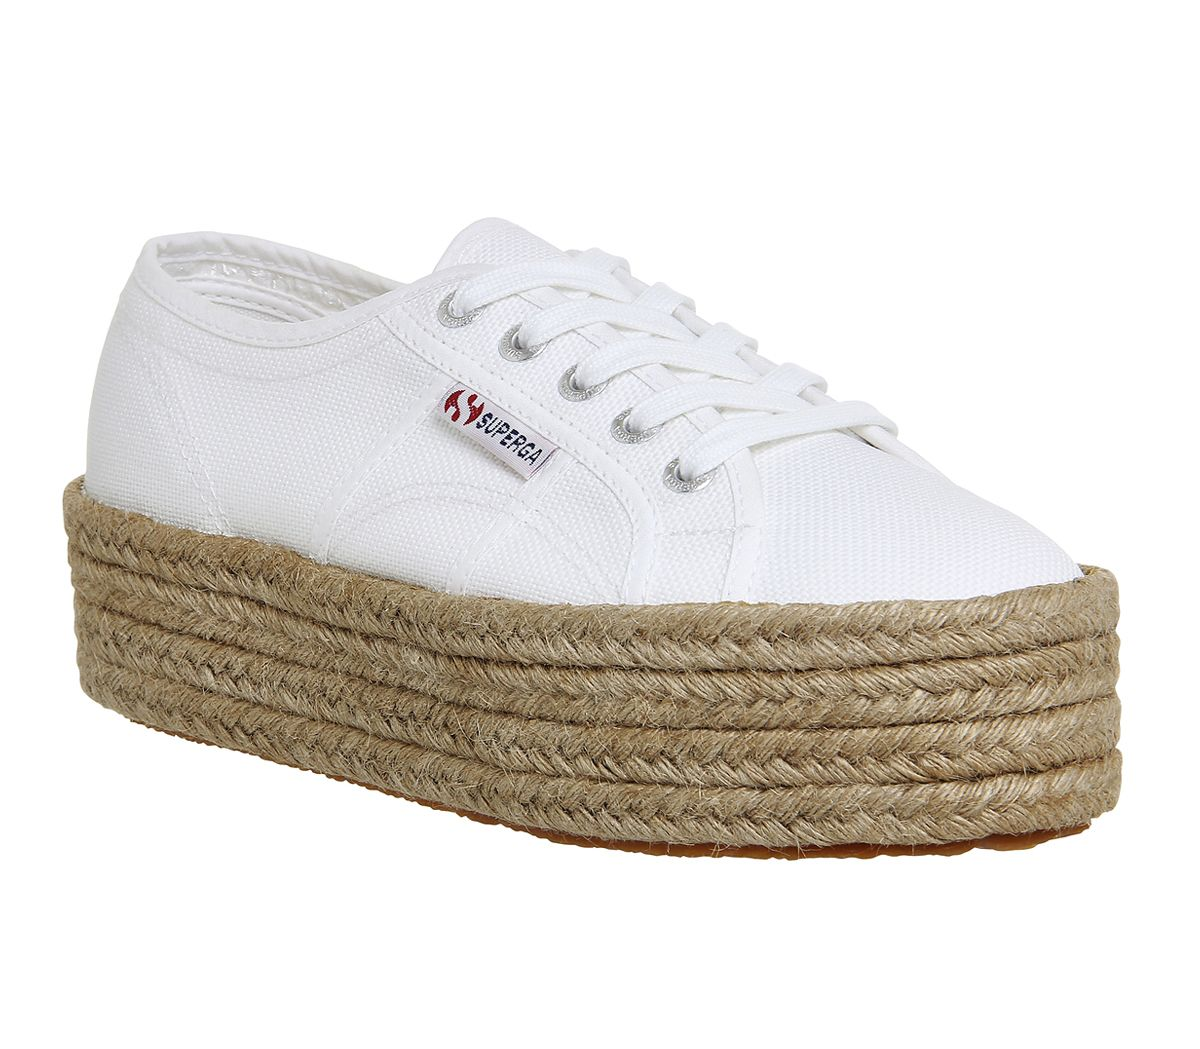 2b56299b7 Superga 2790 White Espadrille - Hers trainers